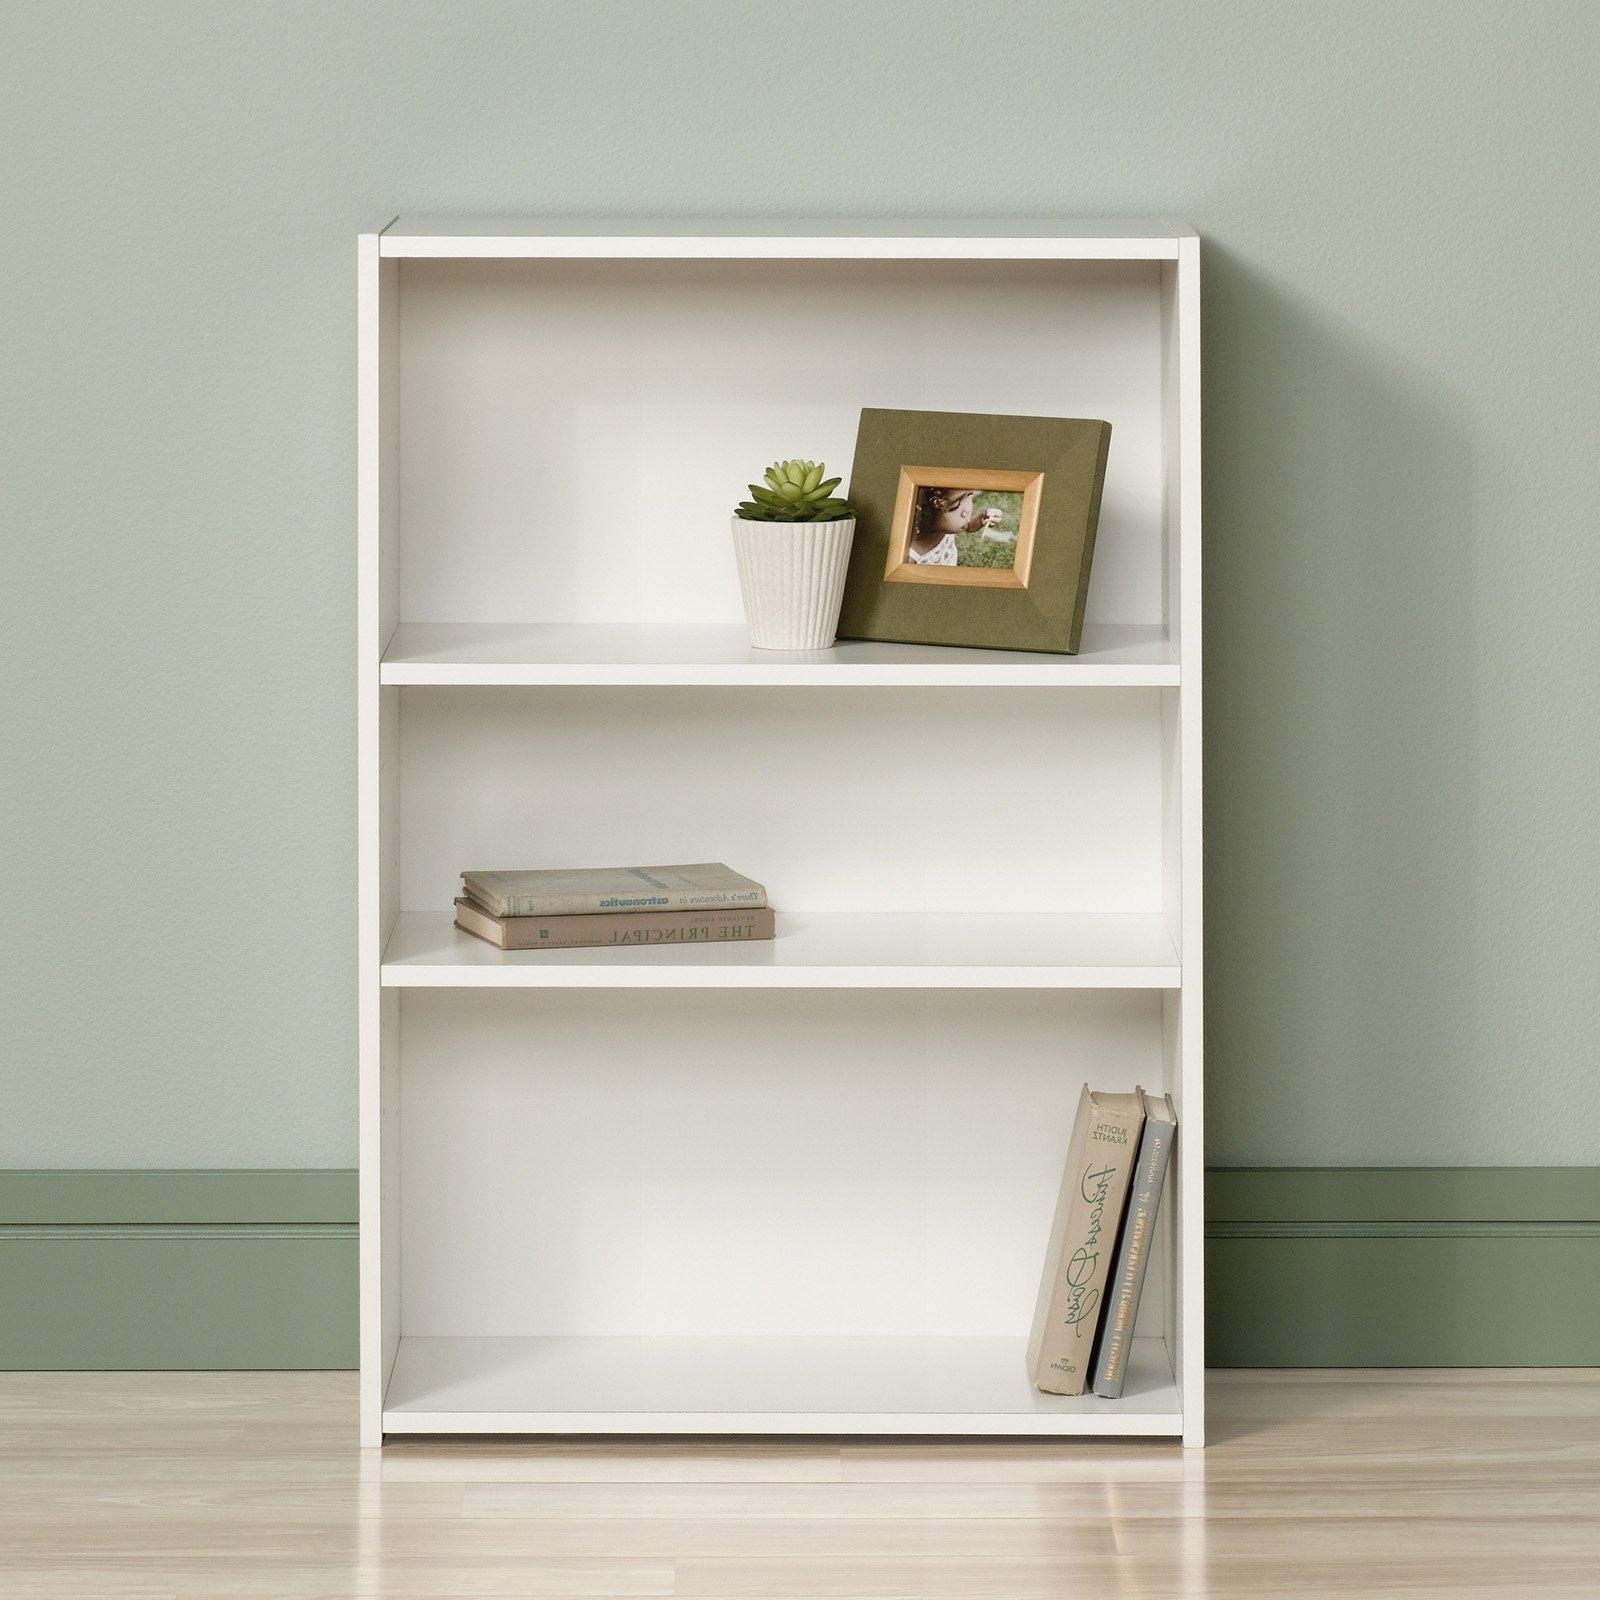 Most Recent Sauder Beginnings 3 Shelf Bookcase, Multiple Finishes – Walmart Intended For Sauder Beginnings 3 Shelf Bookcases (View 5 of 15)